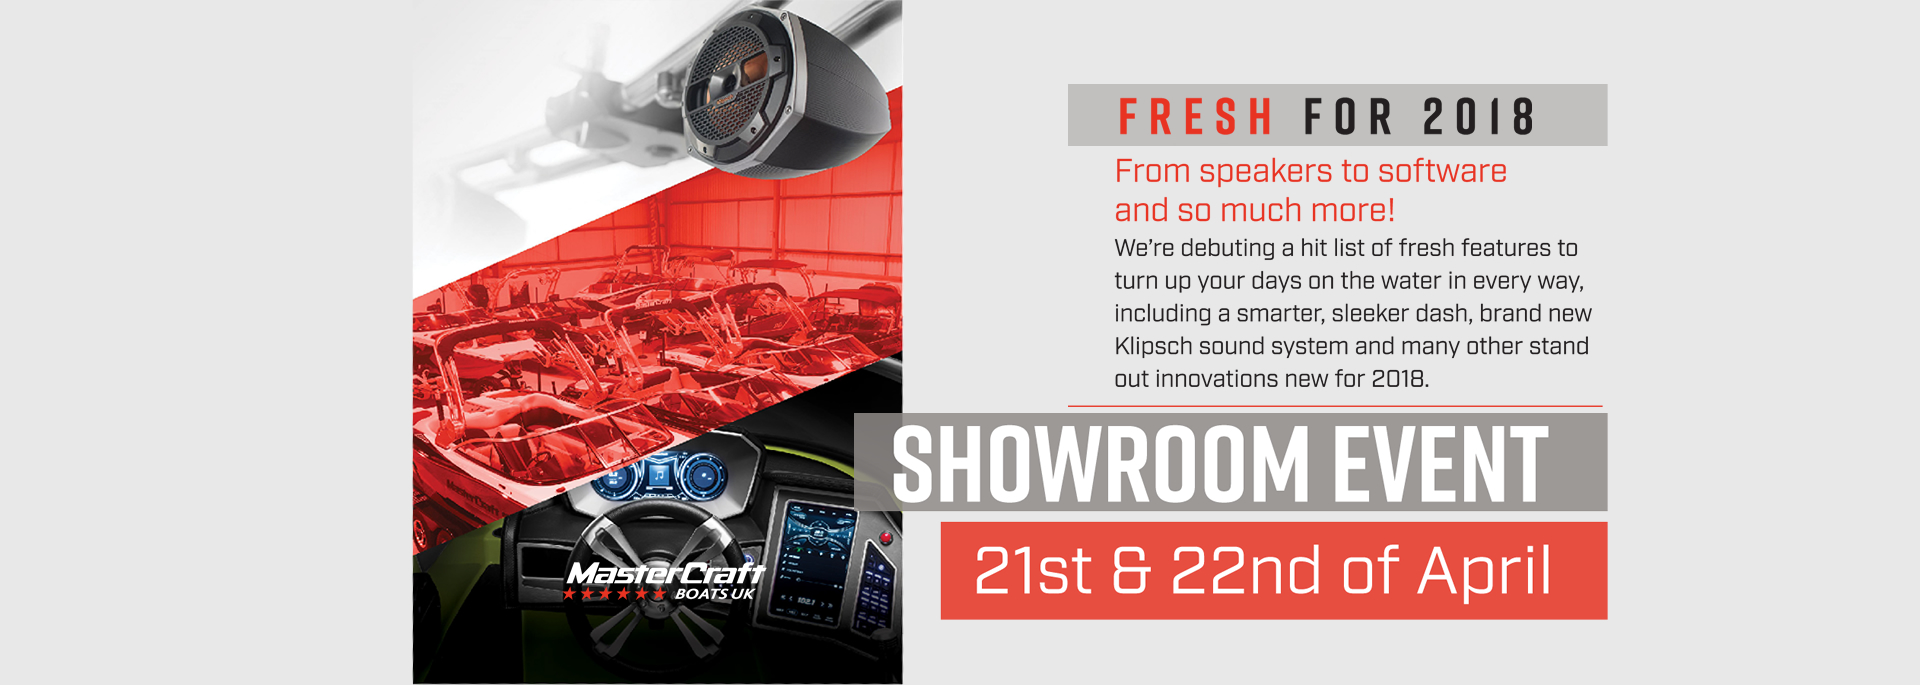 MasterCraft Boats UK Showroom Event